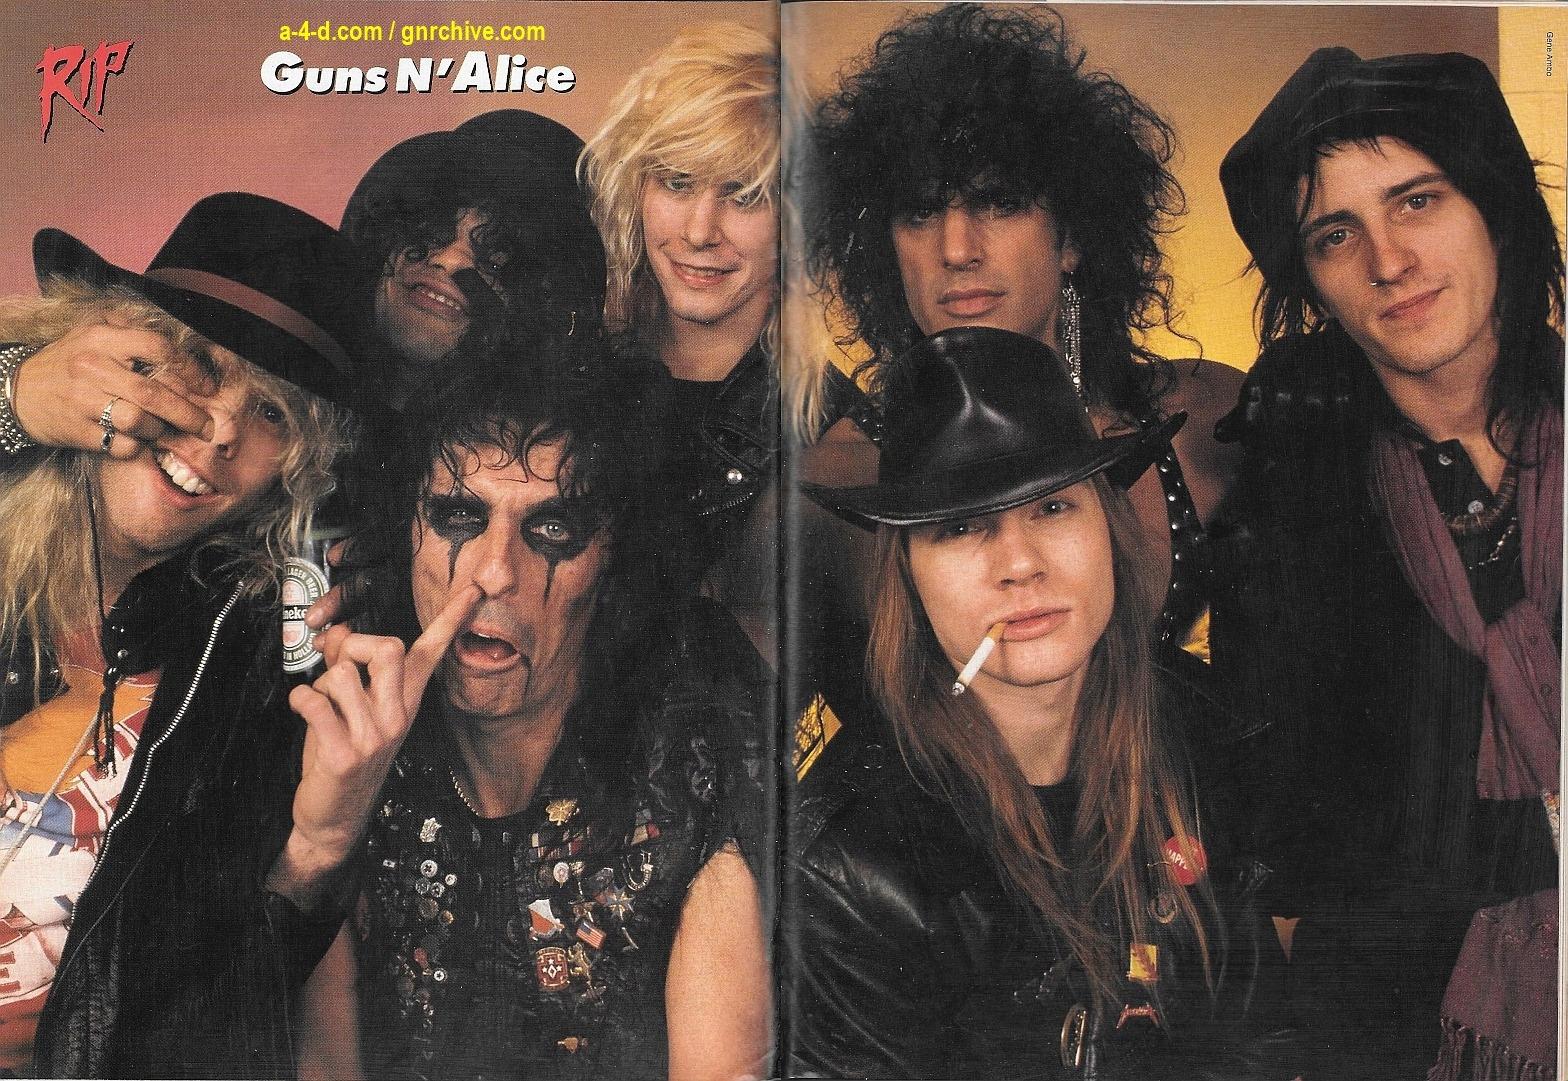 1988.06.DD - RIP Magazine - Guns N' Roses On The Stairway To Rock Heaven (Axl, Slash, Izzy, Duff) 1988_108